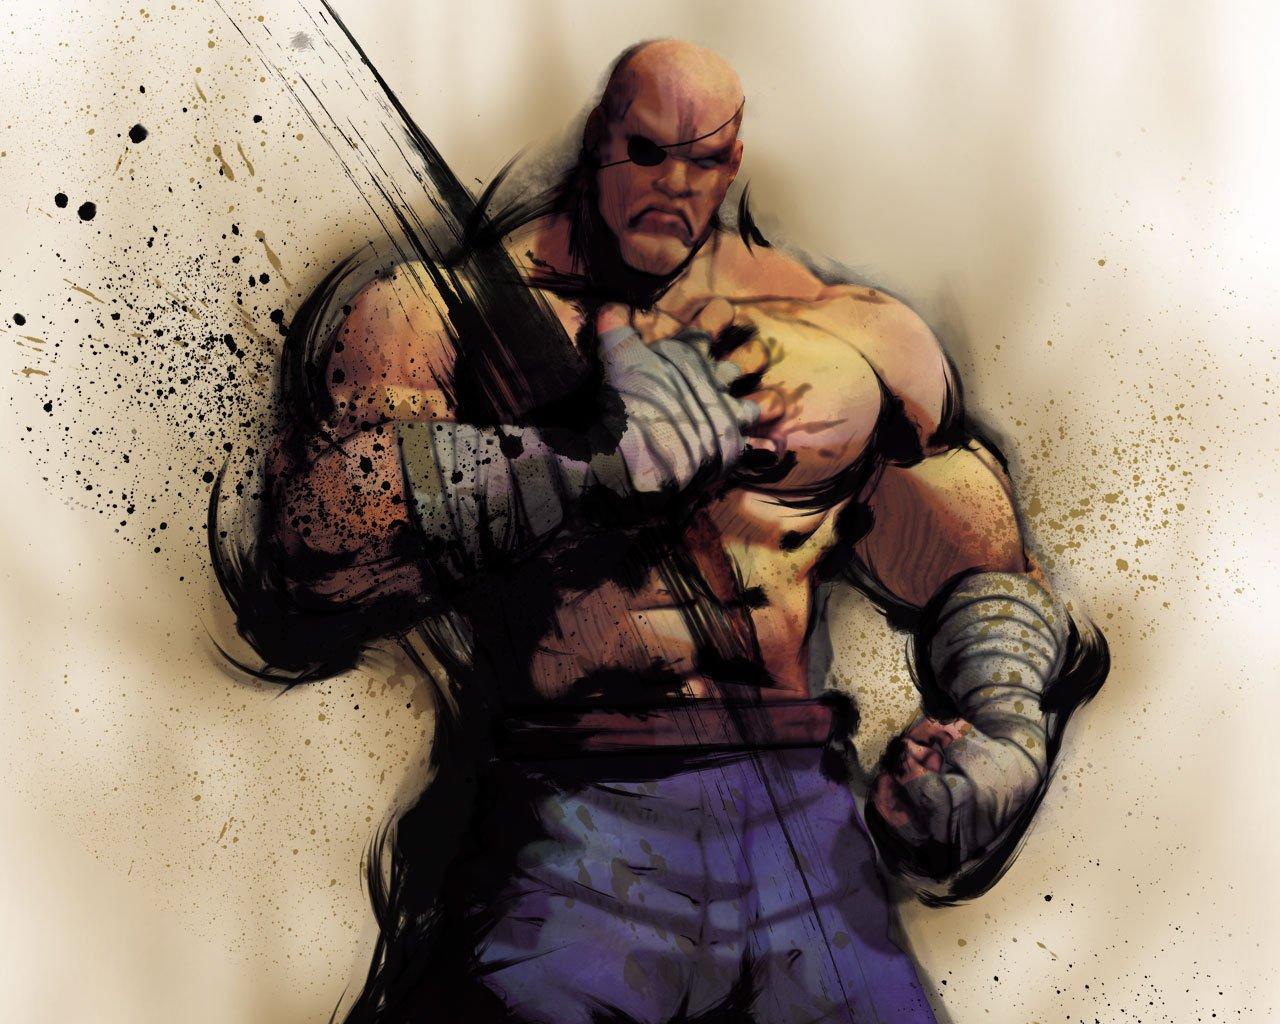 sagat_street_fighter_iv_video_games_wallpaper-4382